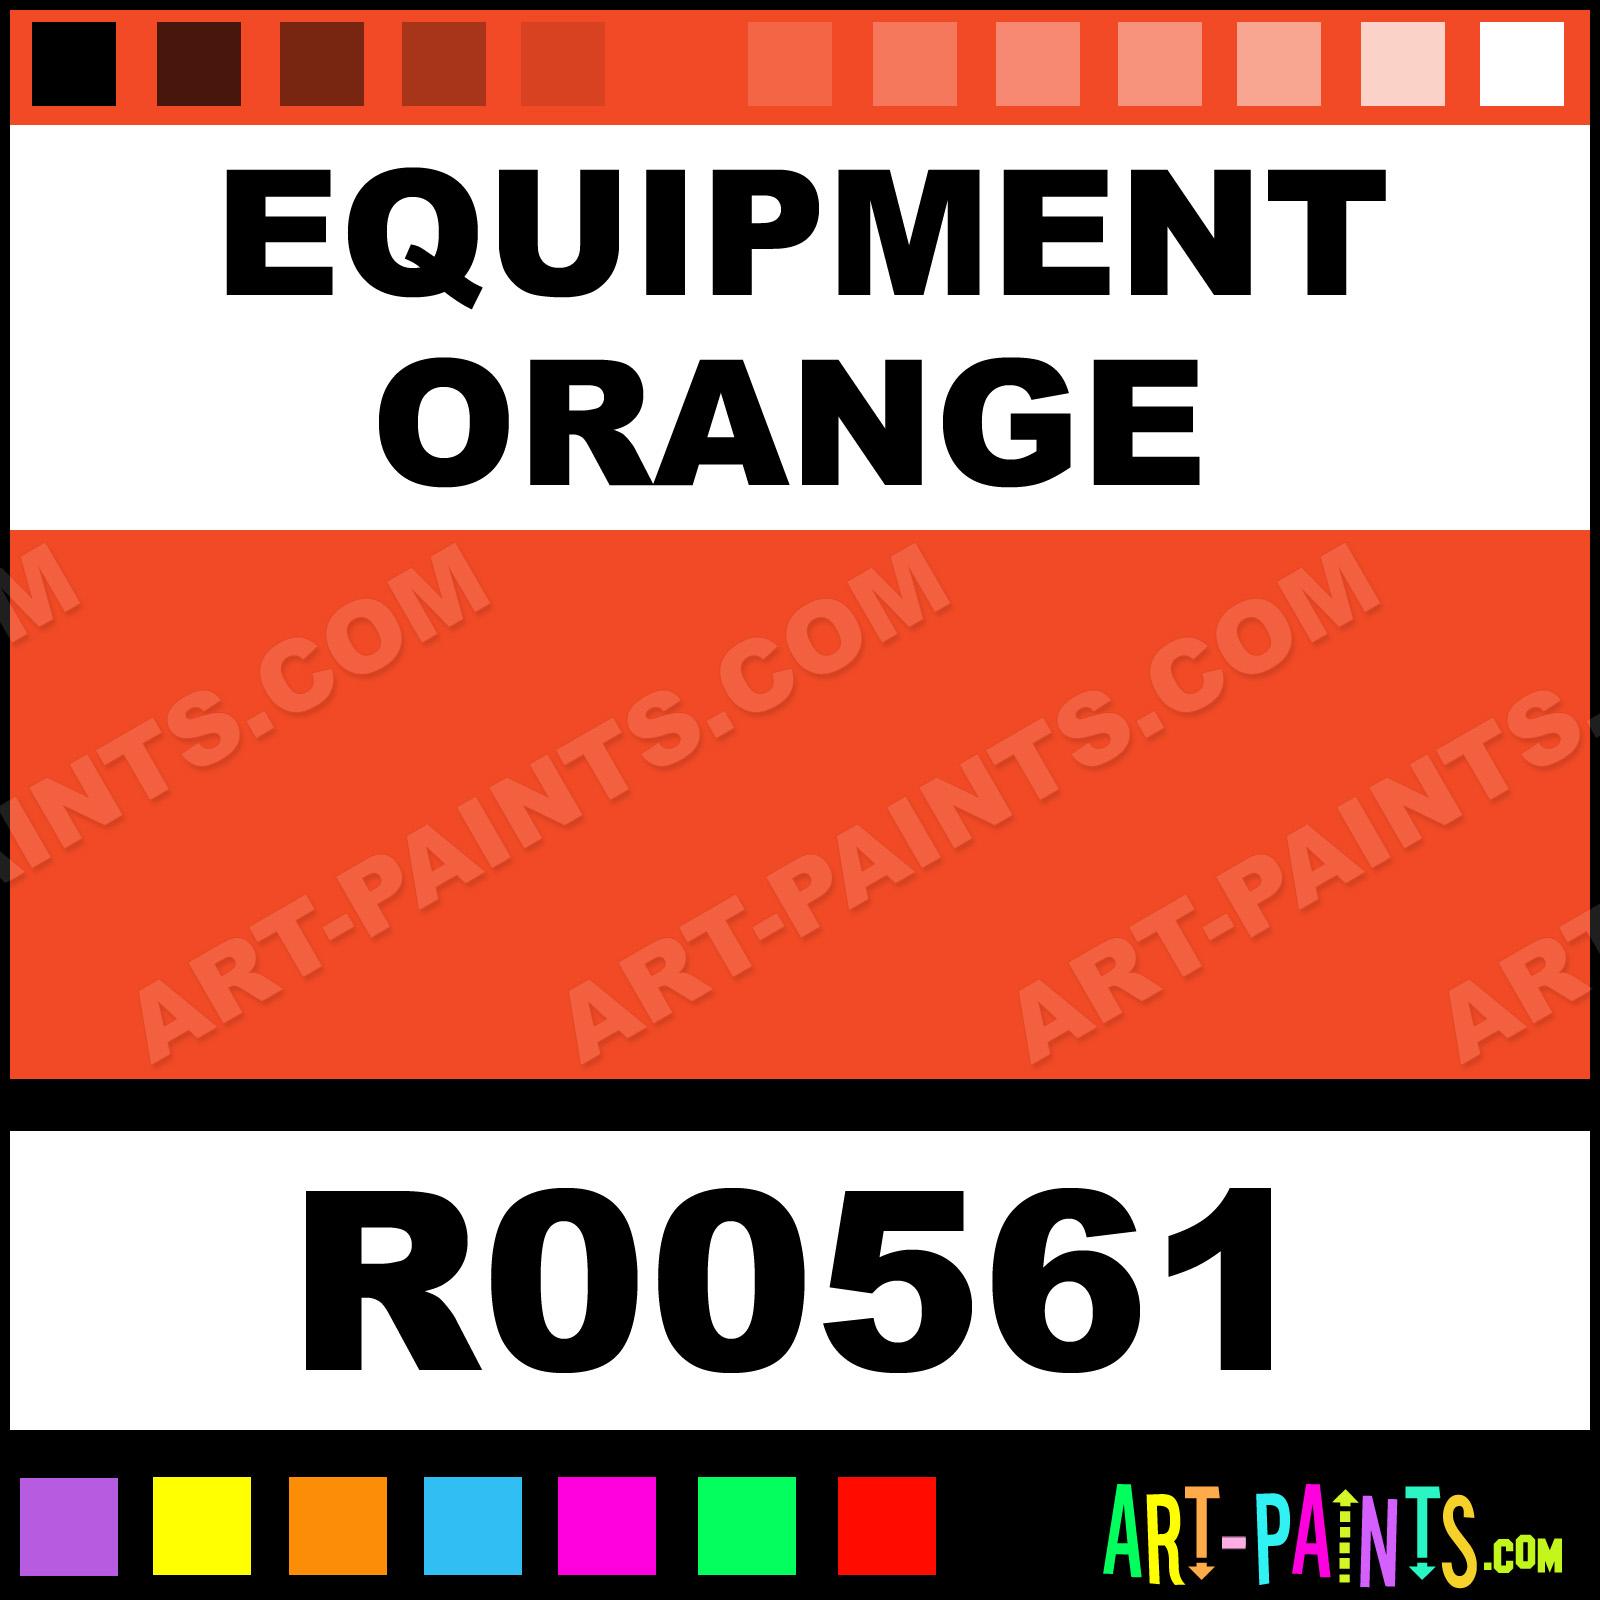 Equipment Orange Rust Tough Acrylic Alkyd Enamel Paints